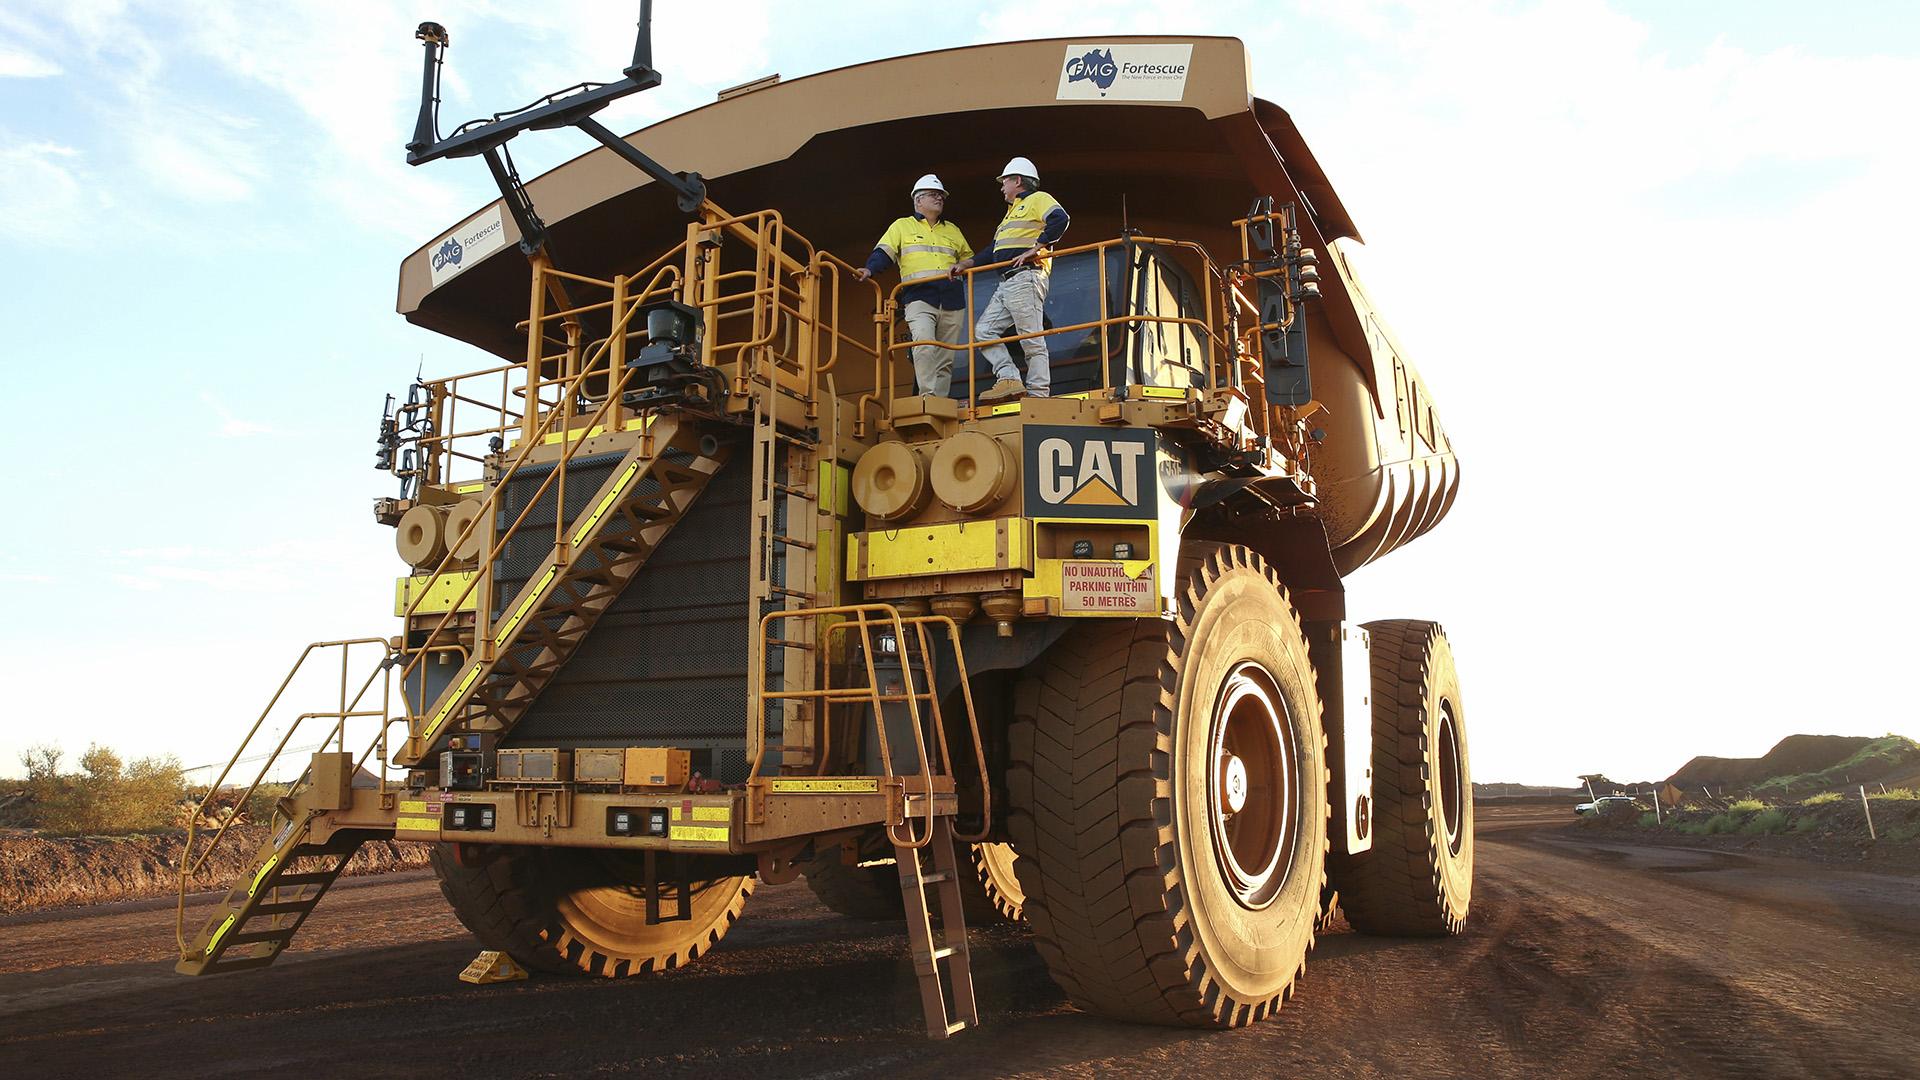 Western Australia Mining Kept Economy Going, Says PM